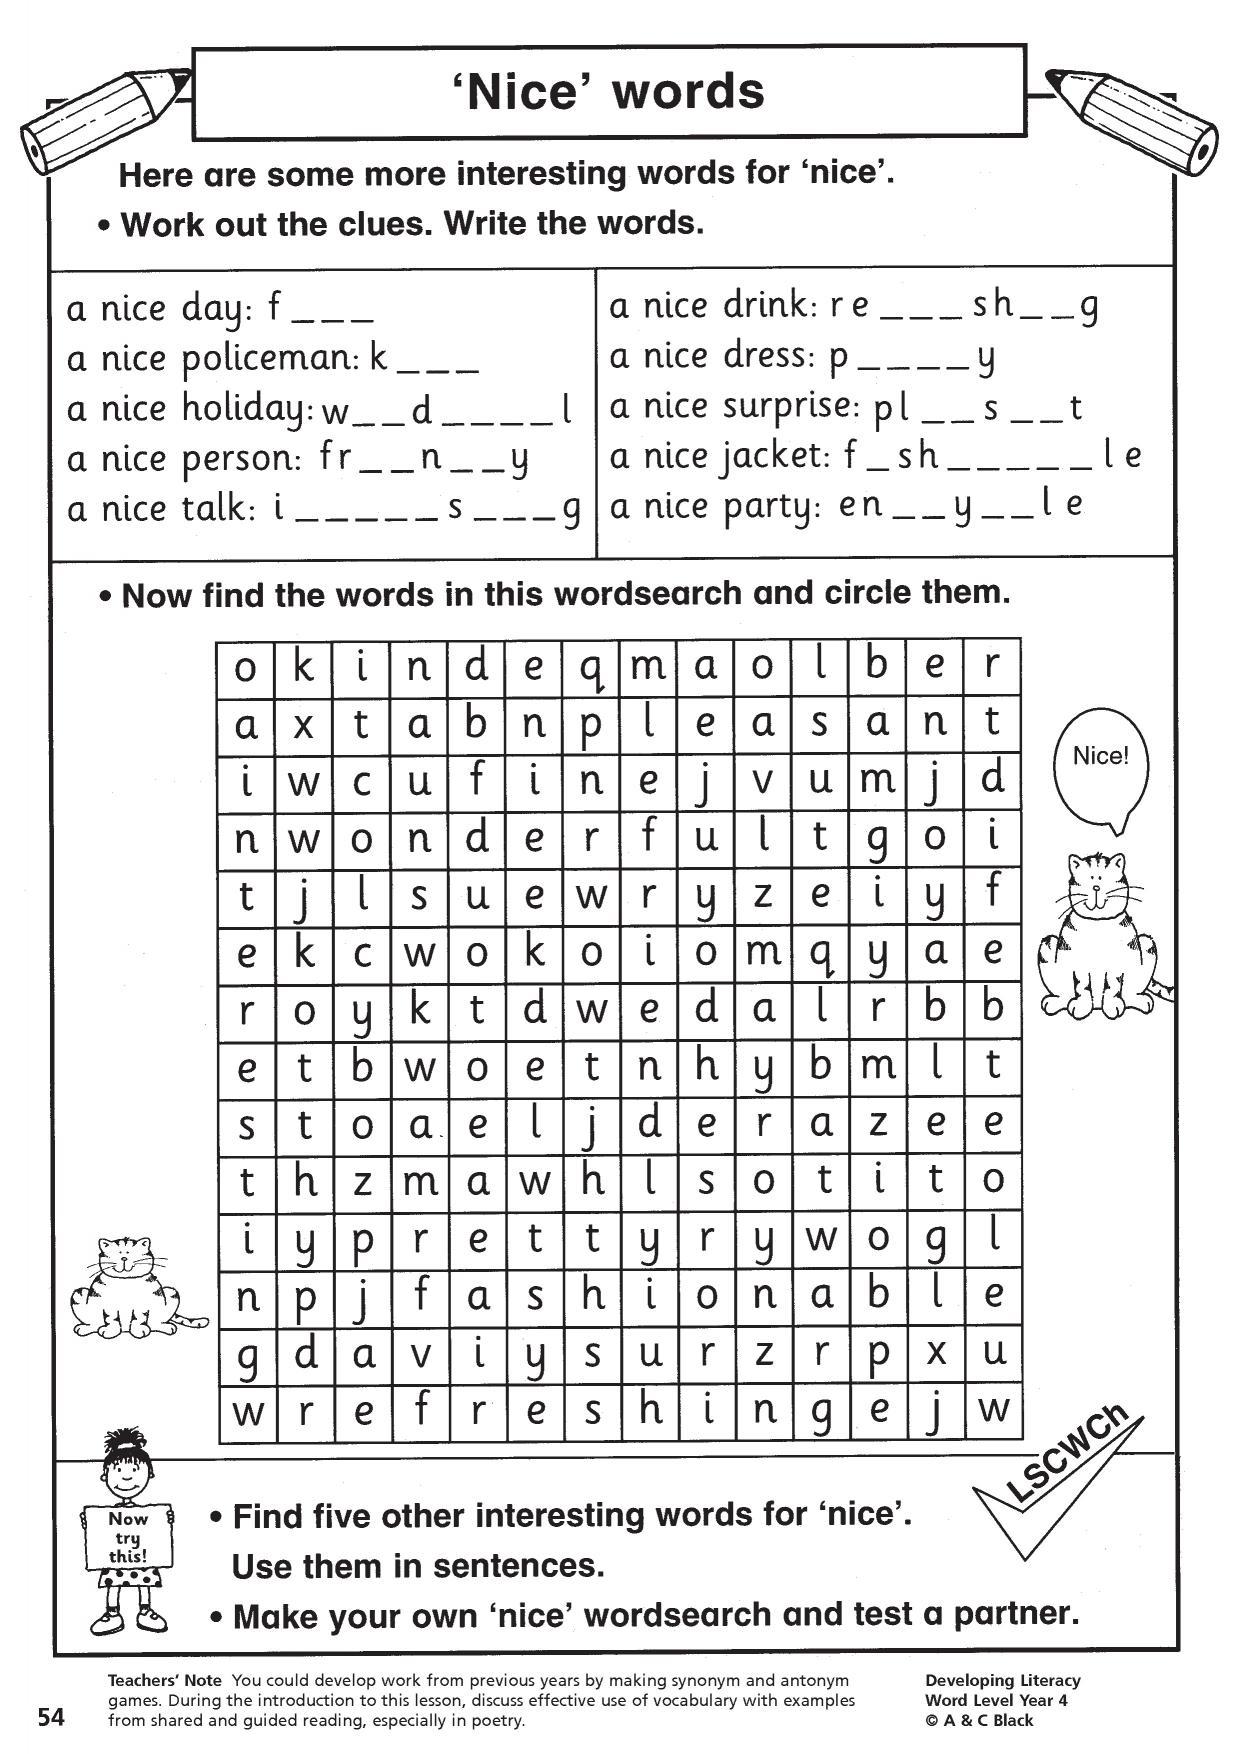 Finding Antonyms Of Words